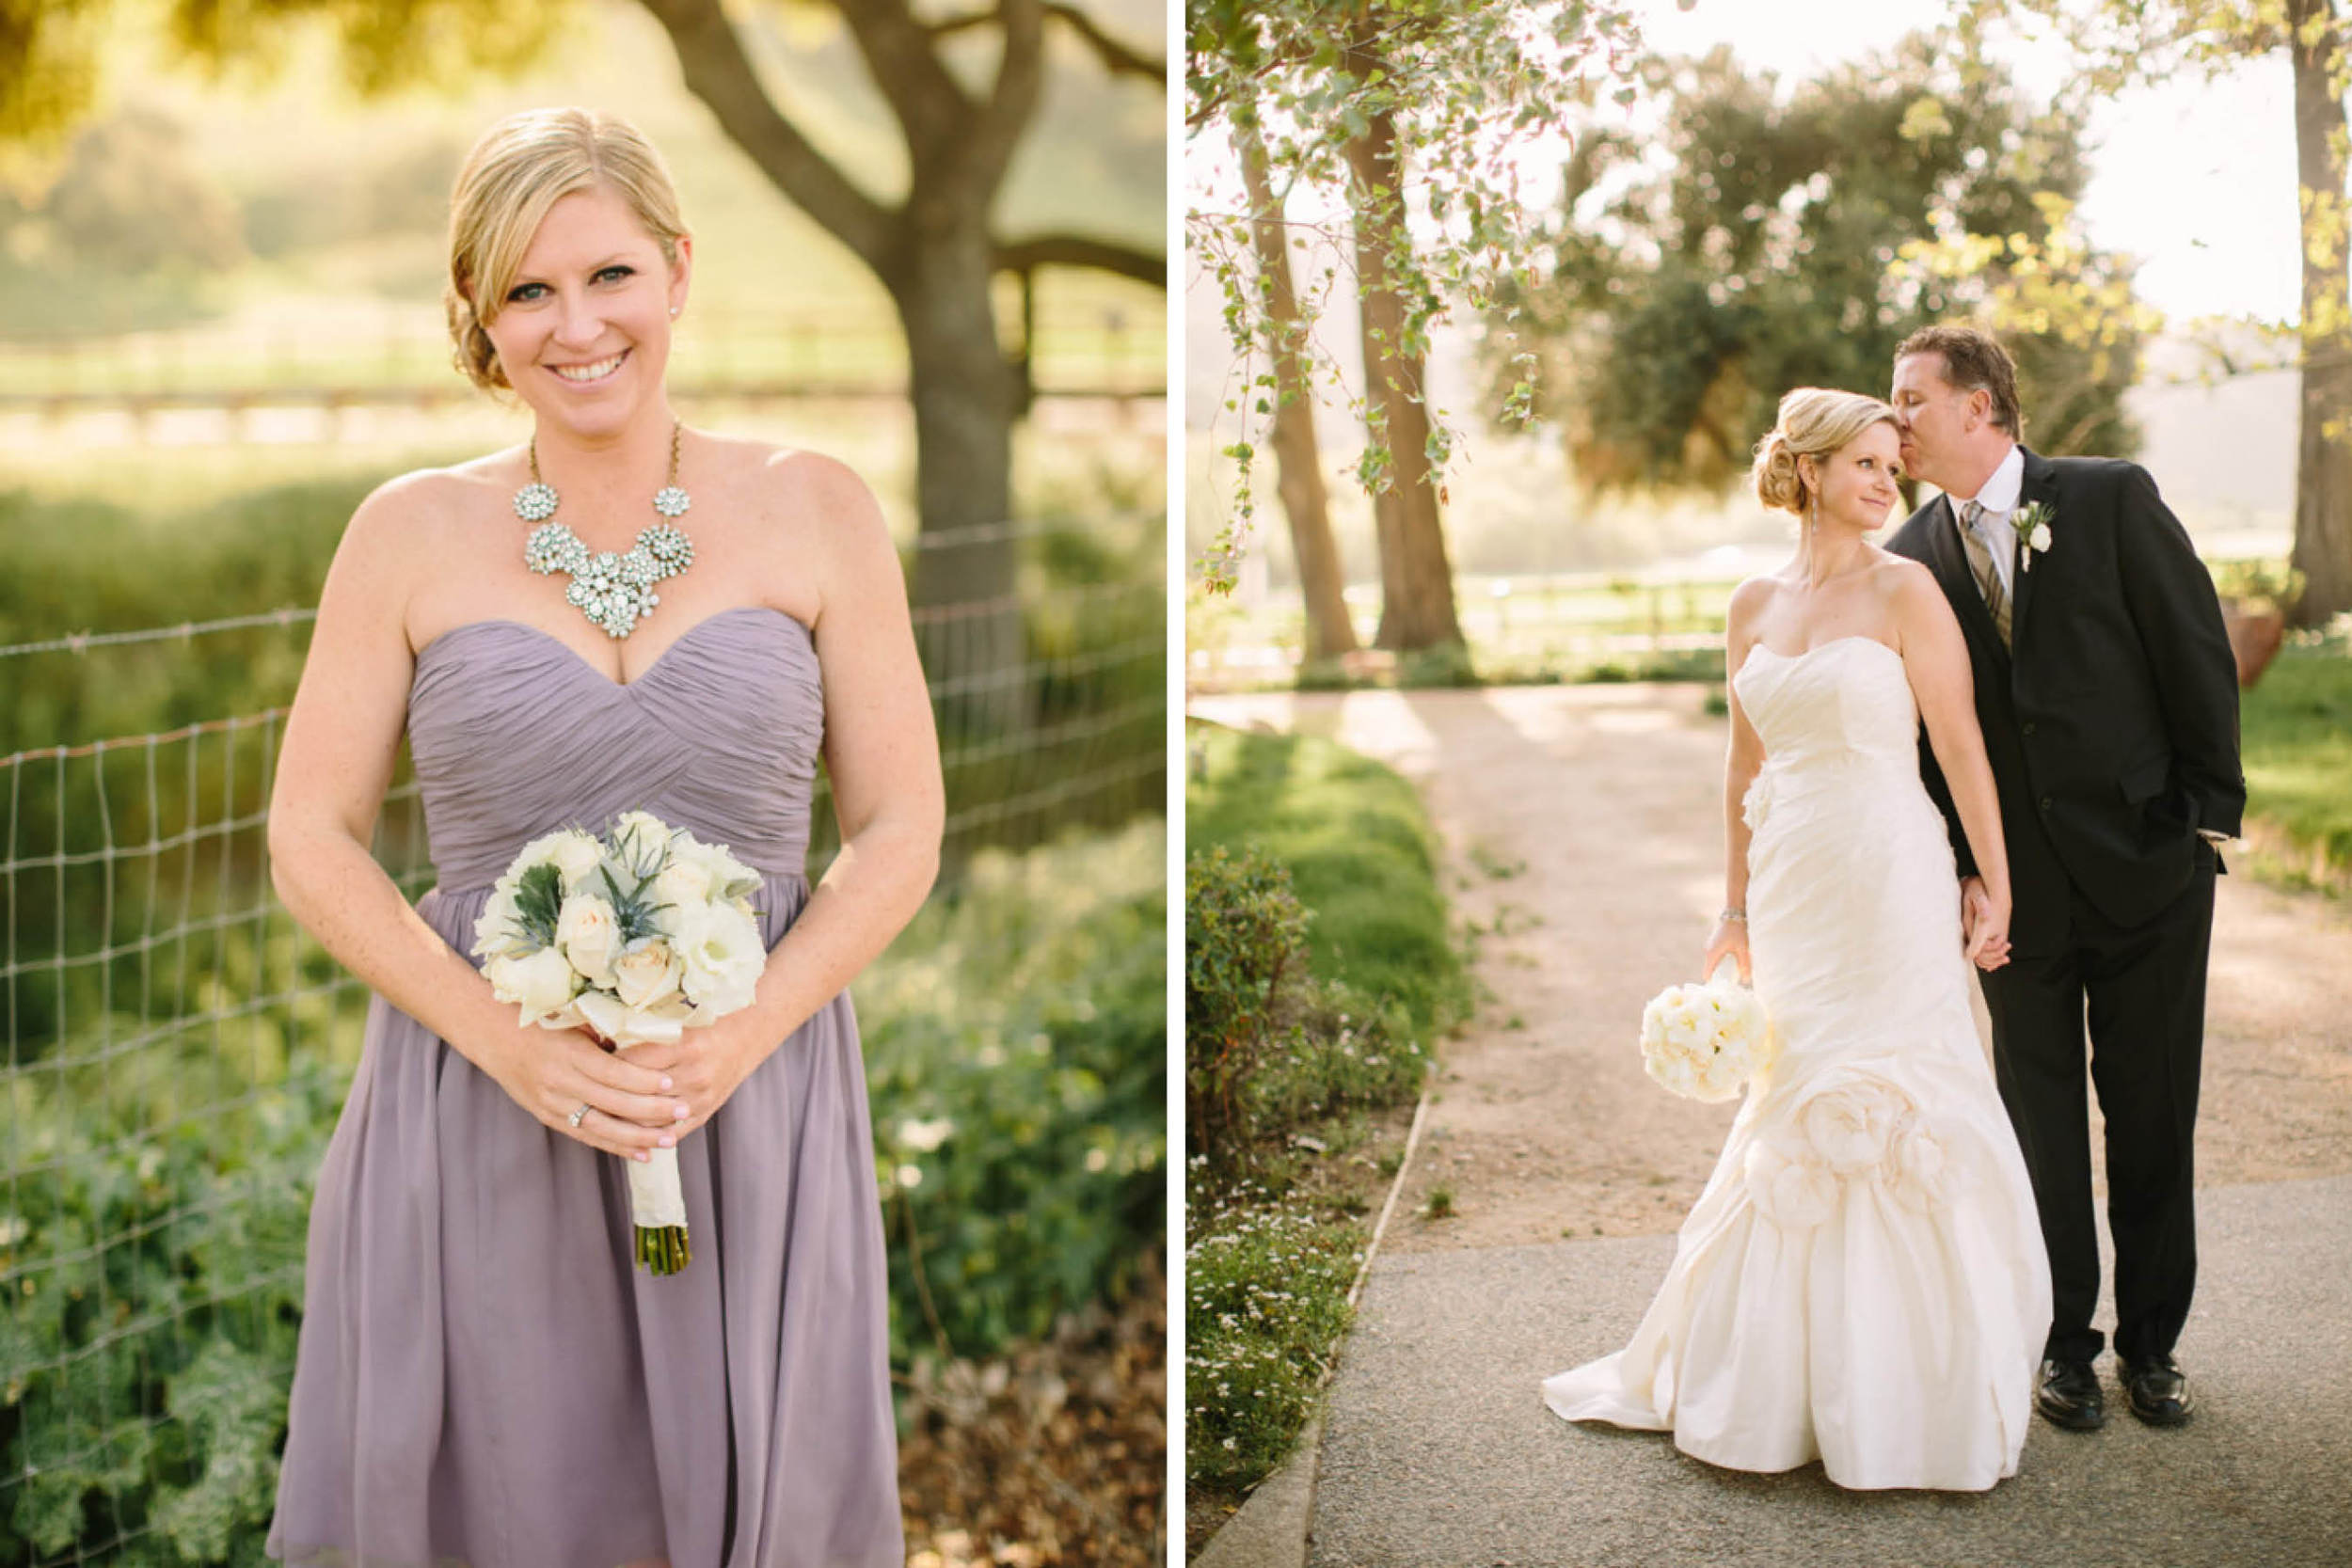 alegria-by-design-tres-hermanas-winery-vineyard-wedding-planner-coordinator-santa-barbara-ynez-maria (12).jpg